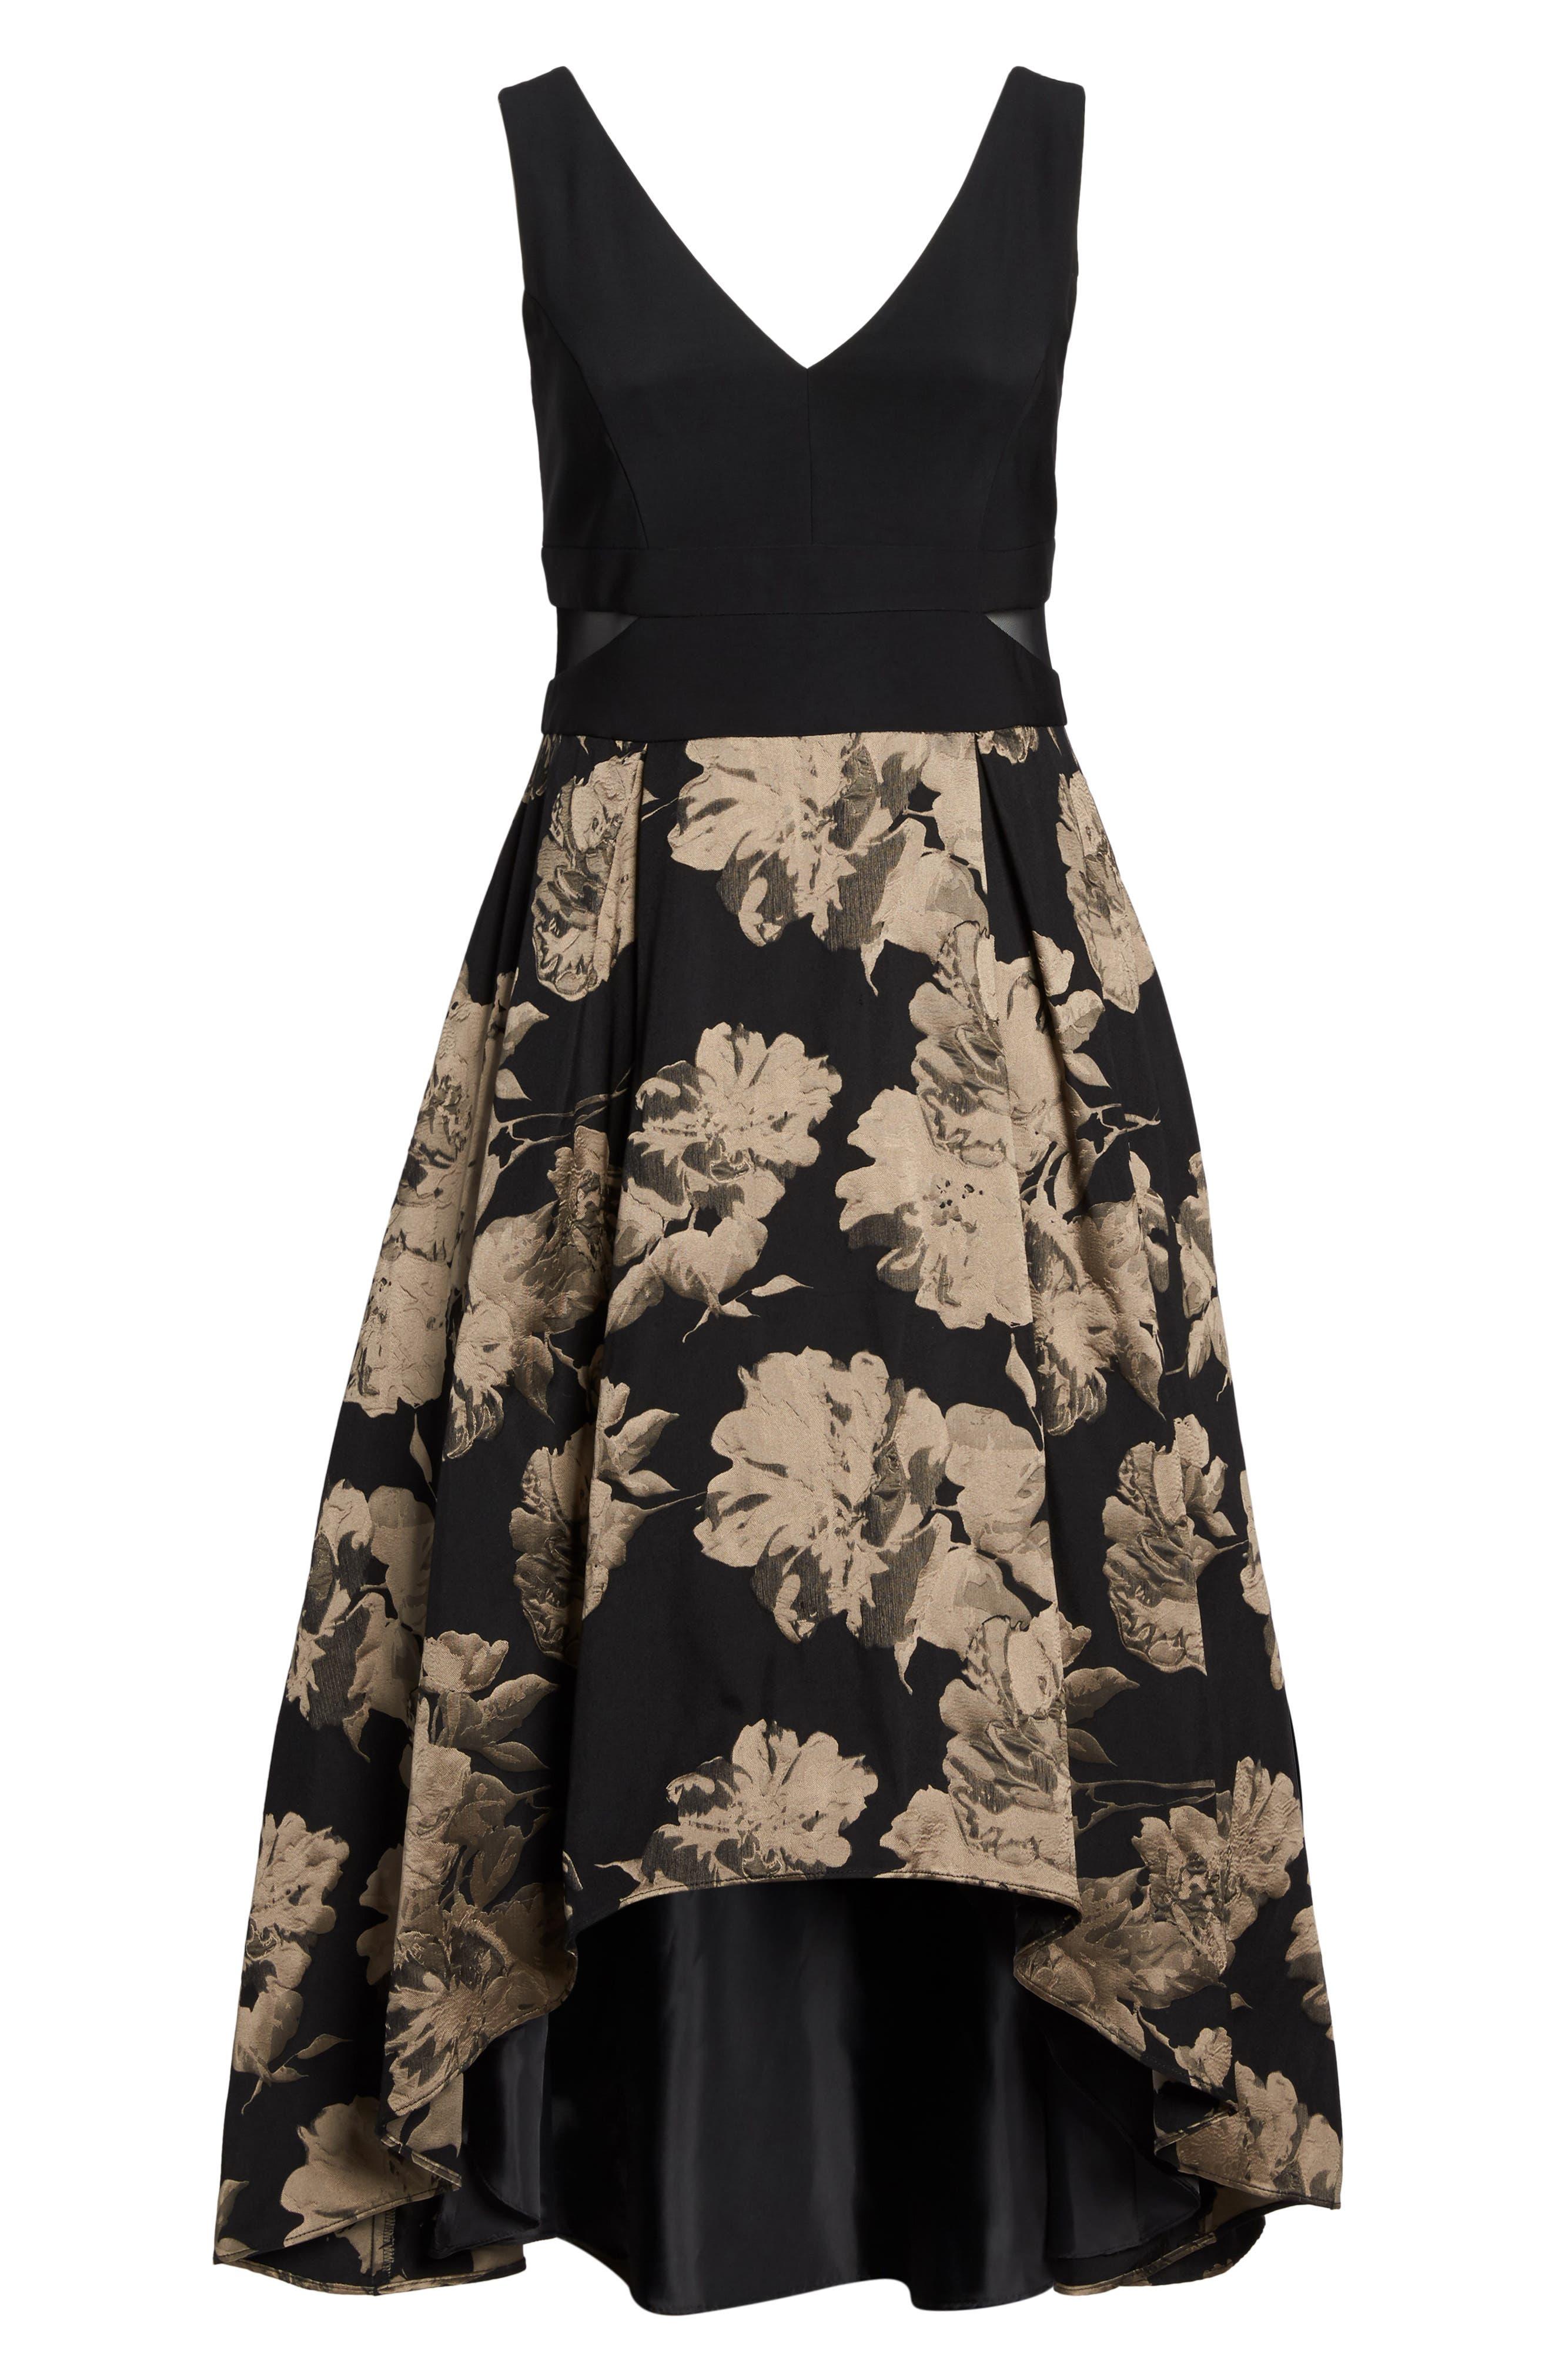 Mesh Waist High/Low Brocade Dress,                             Alternate thumbnail 6, color,                             Black/ Champagne